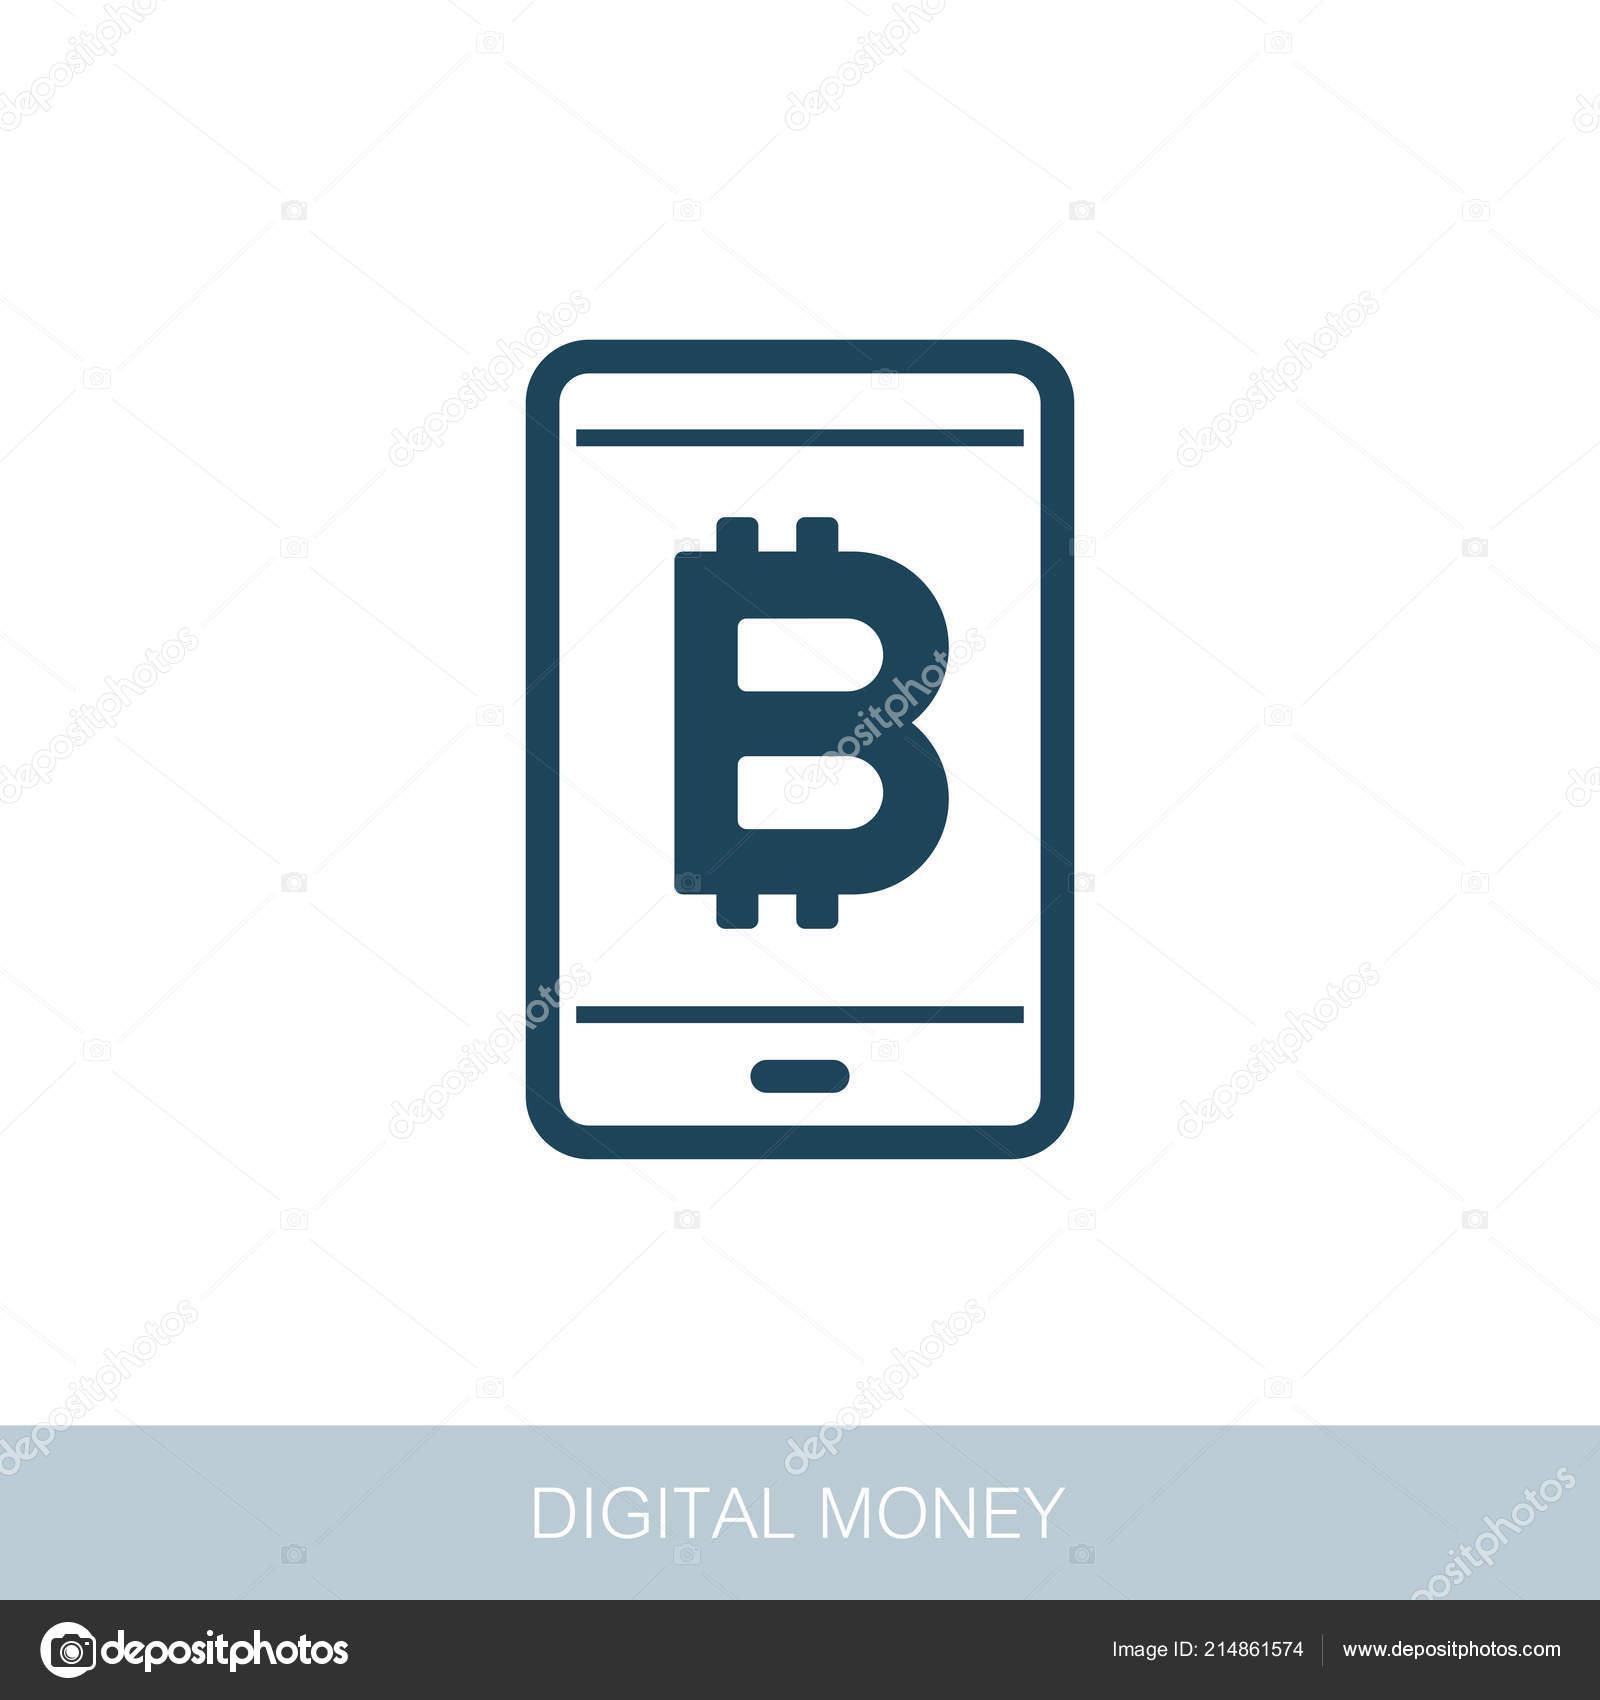 Bitcoin and altcoins app